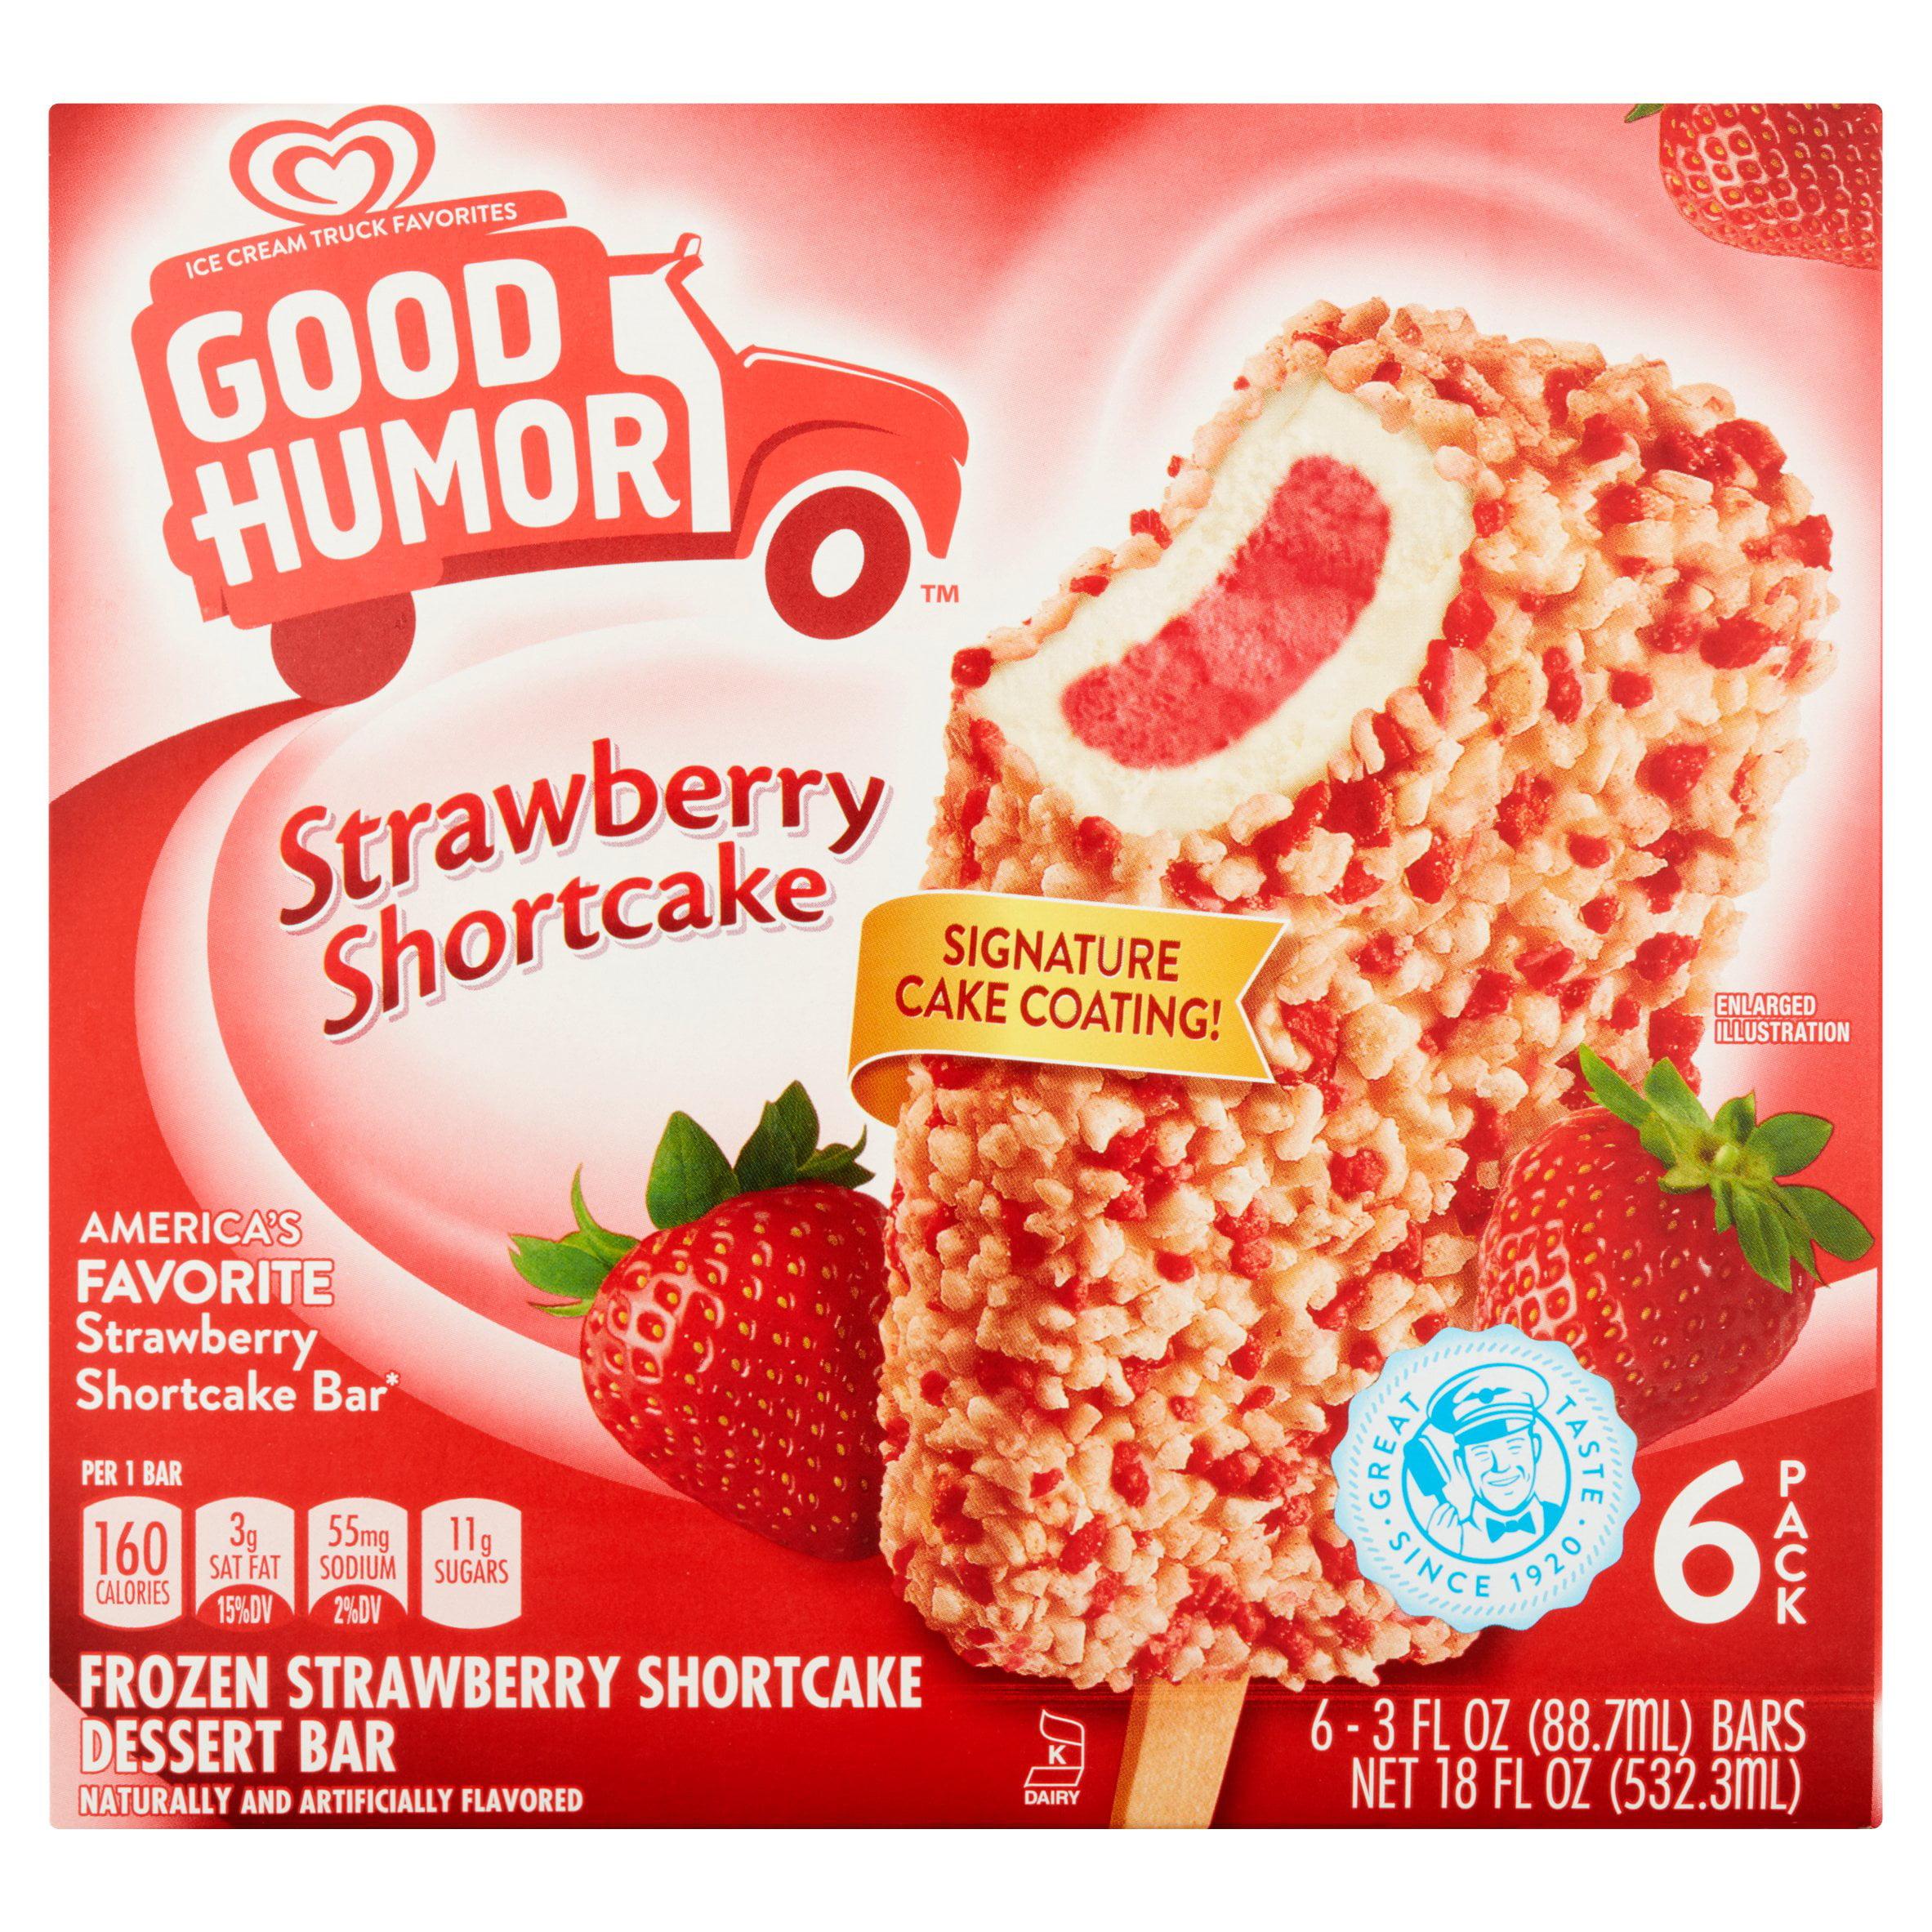 Good Humor Frozen Strawberry Shortcake Dessert Bar, 3 fl oz, 6 count by Unilever